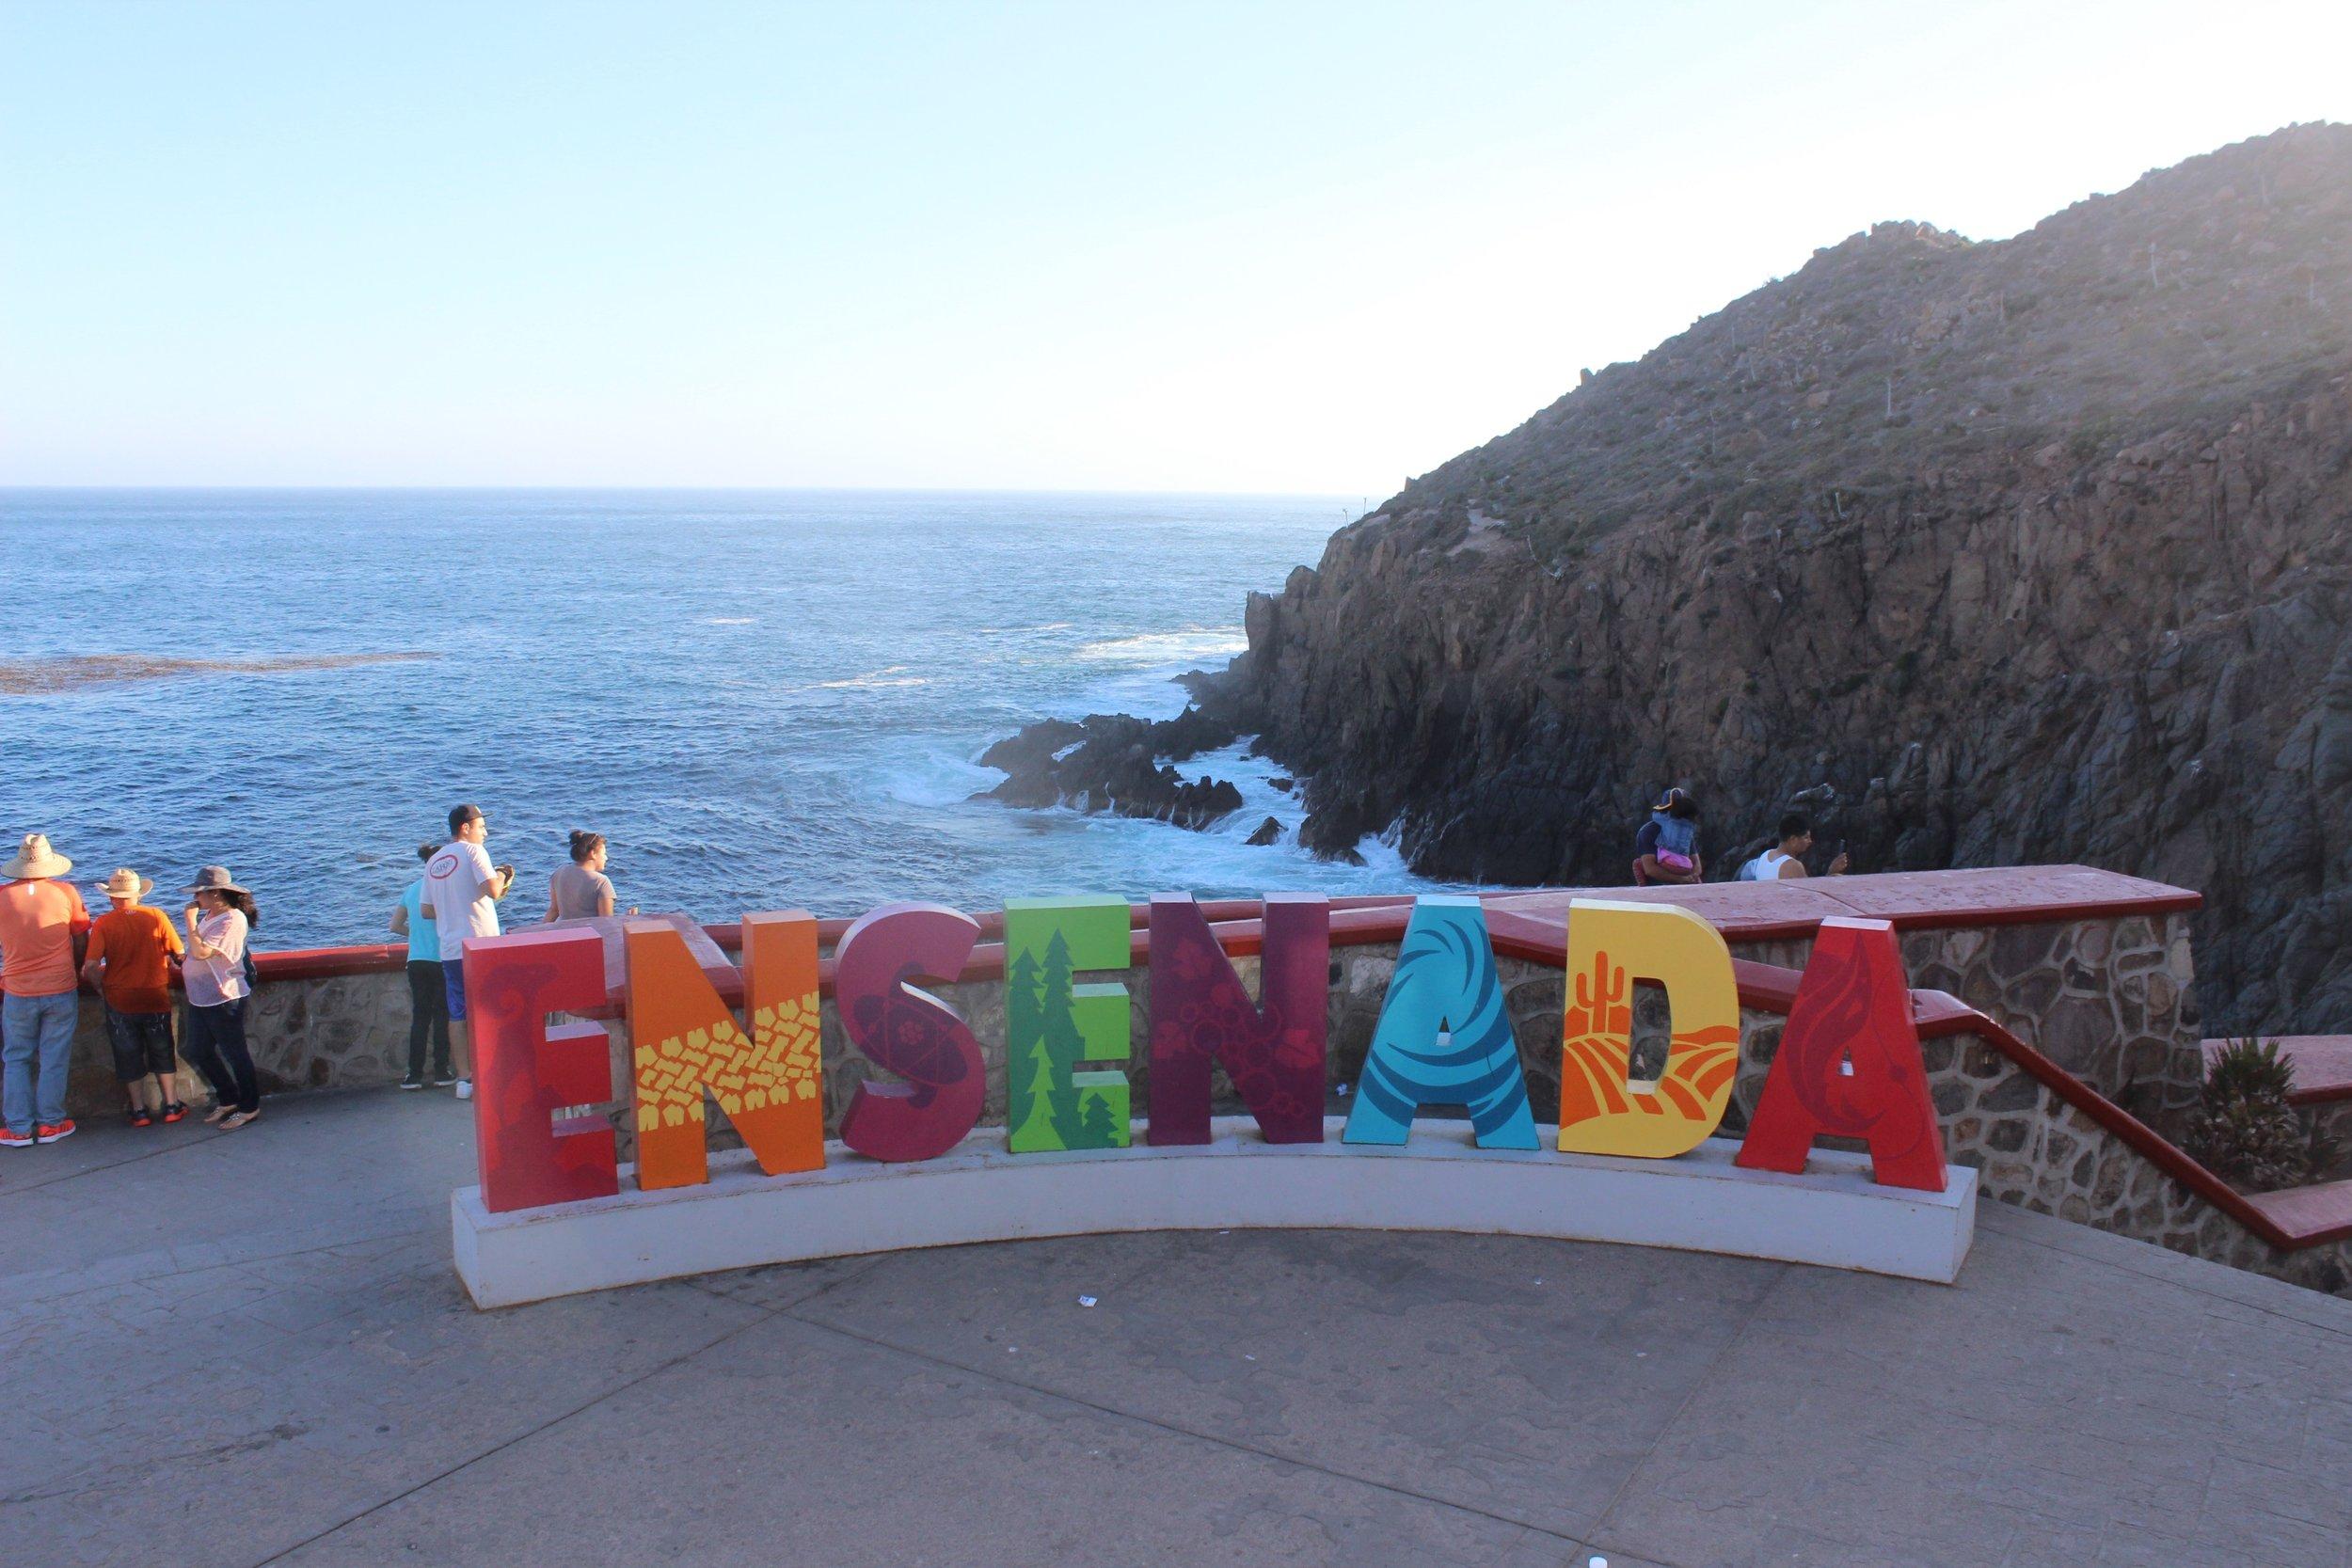 Pictures of ensenada mexico